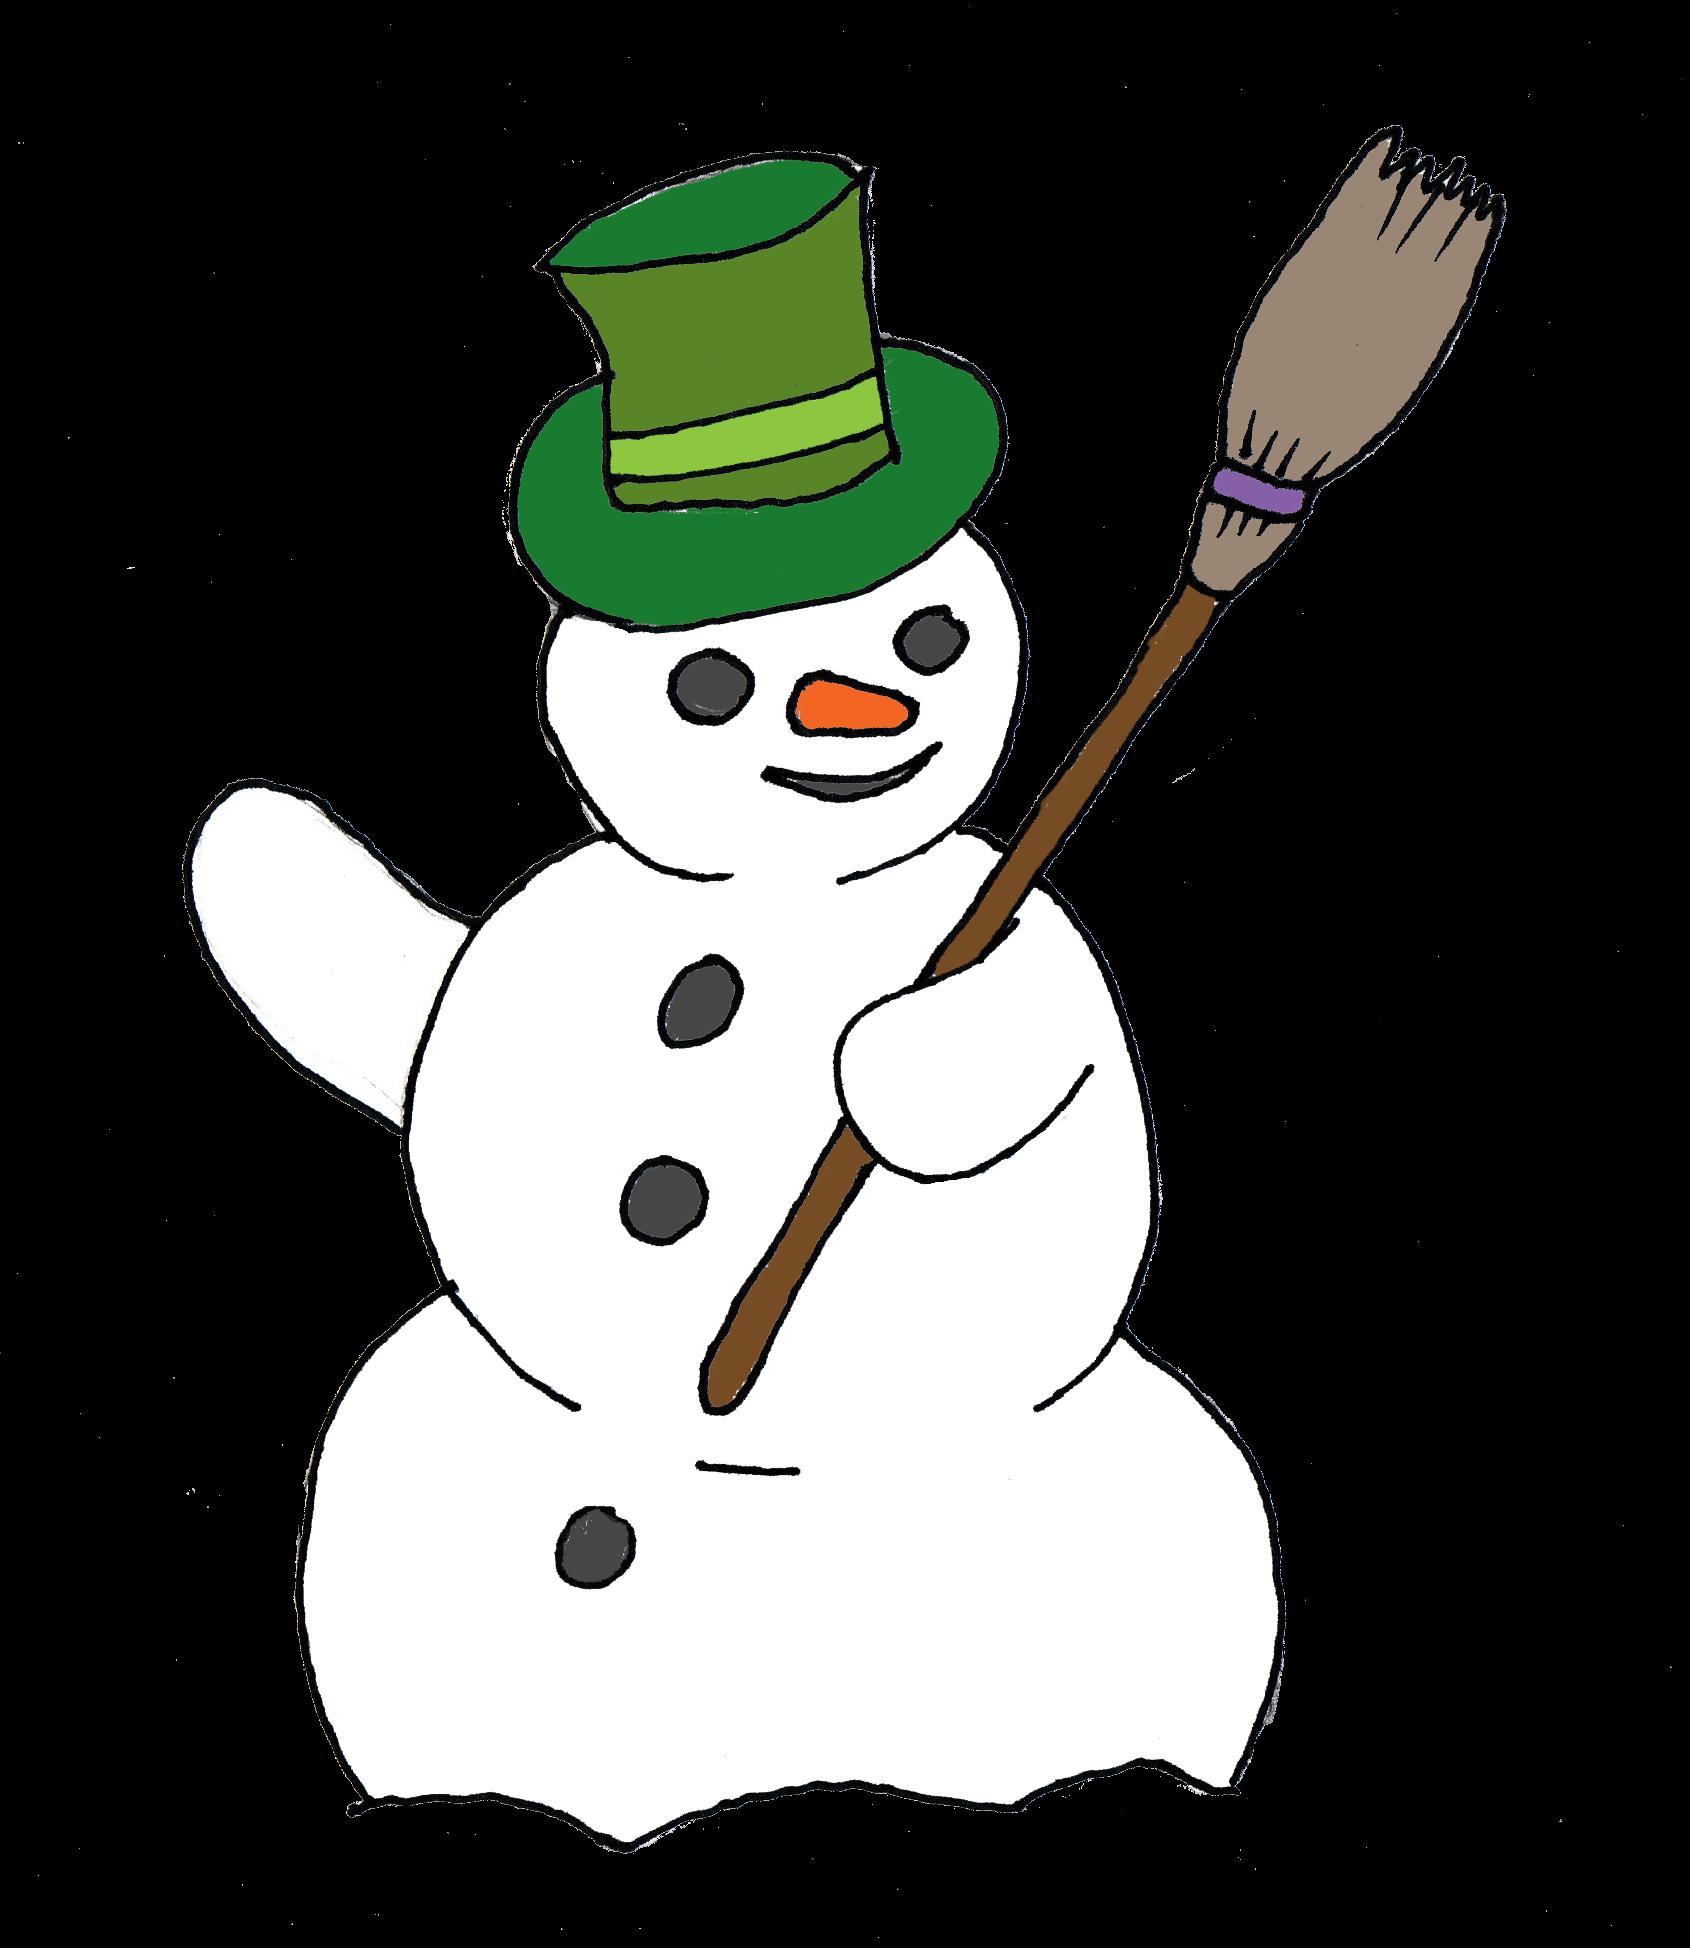 Free border panda images. Coal clipart snowman